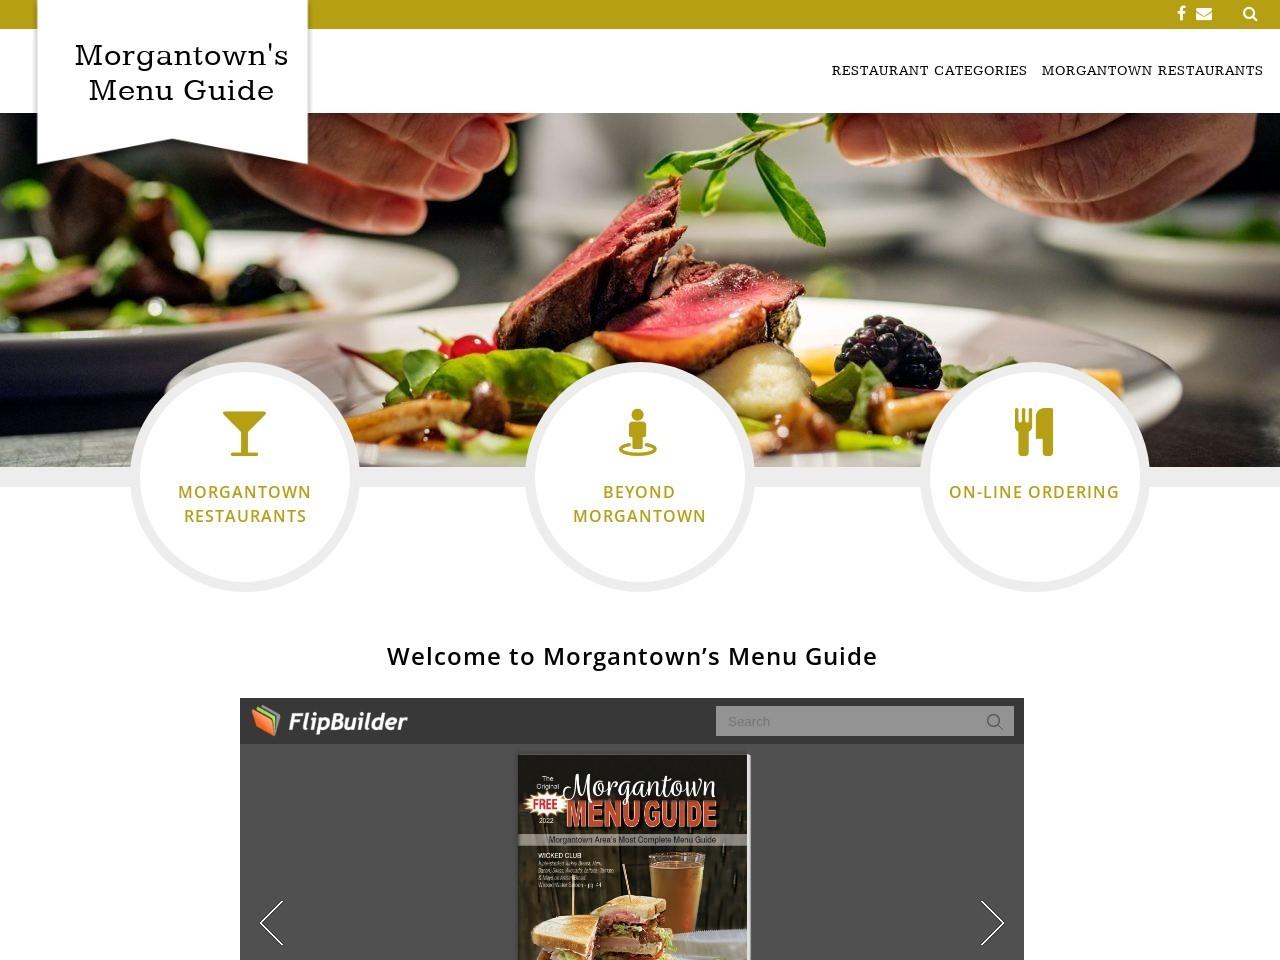 morgantownmenuguide.com